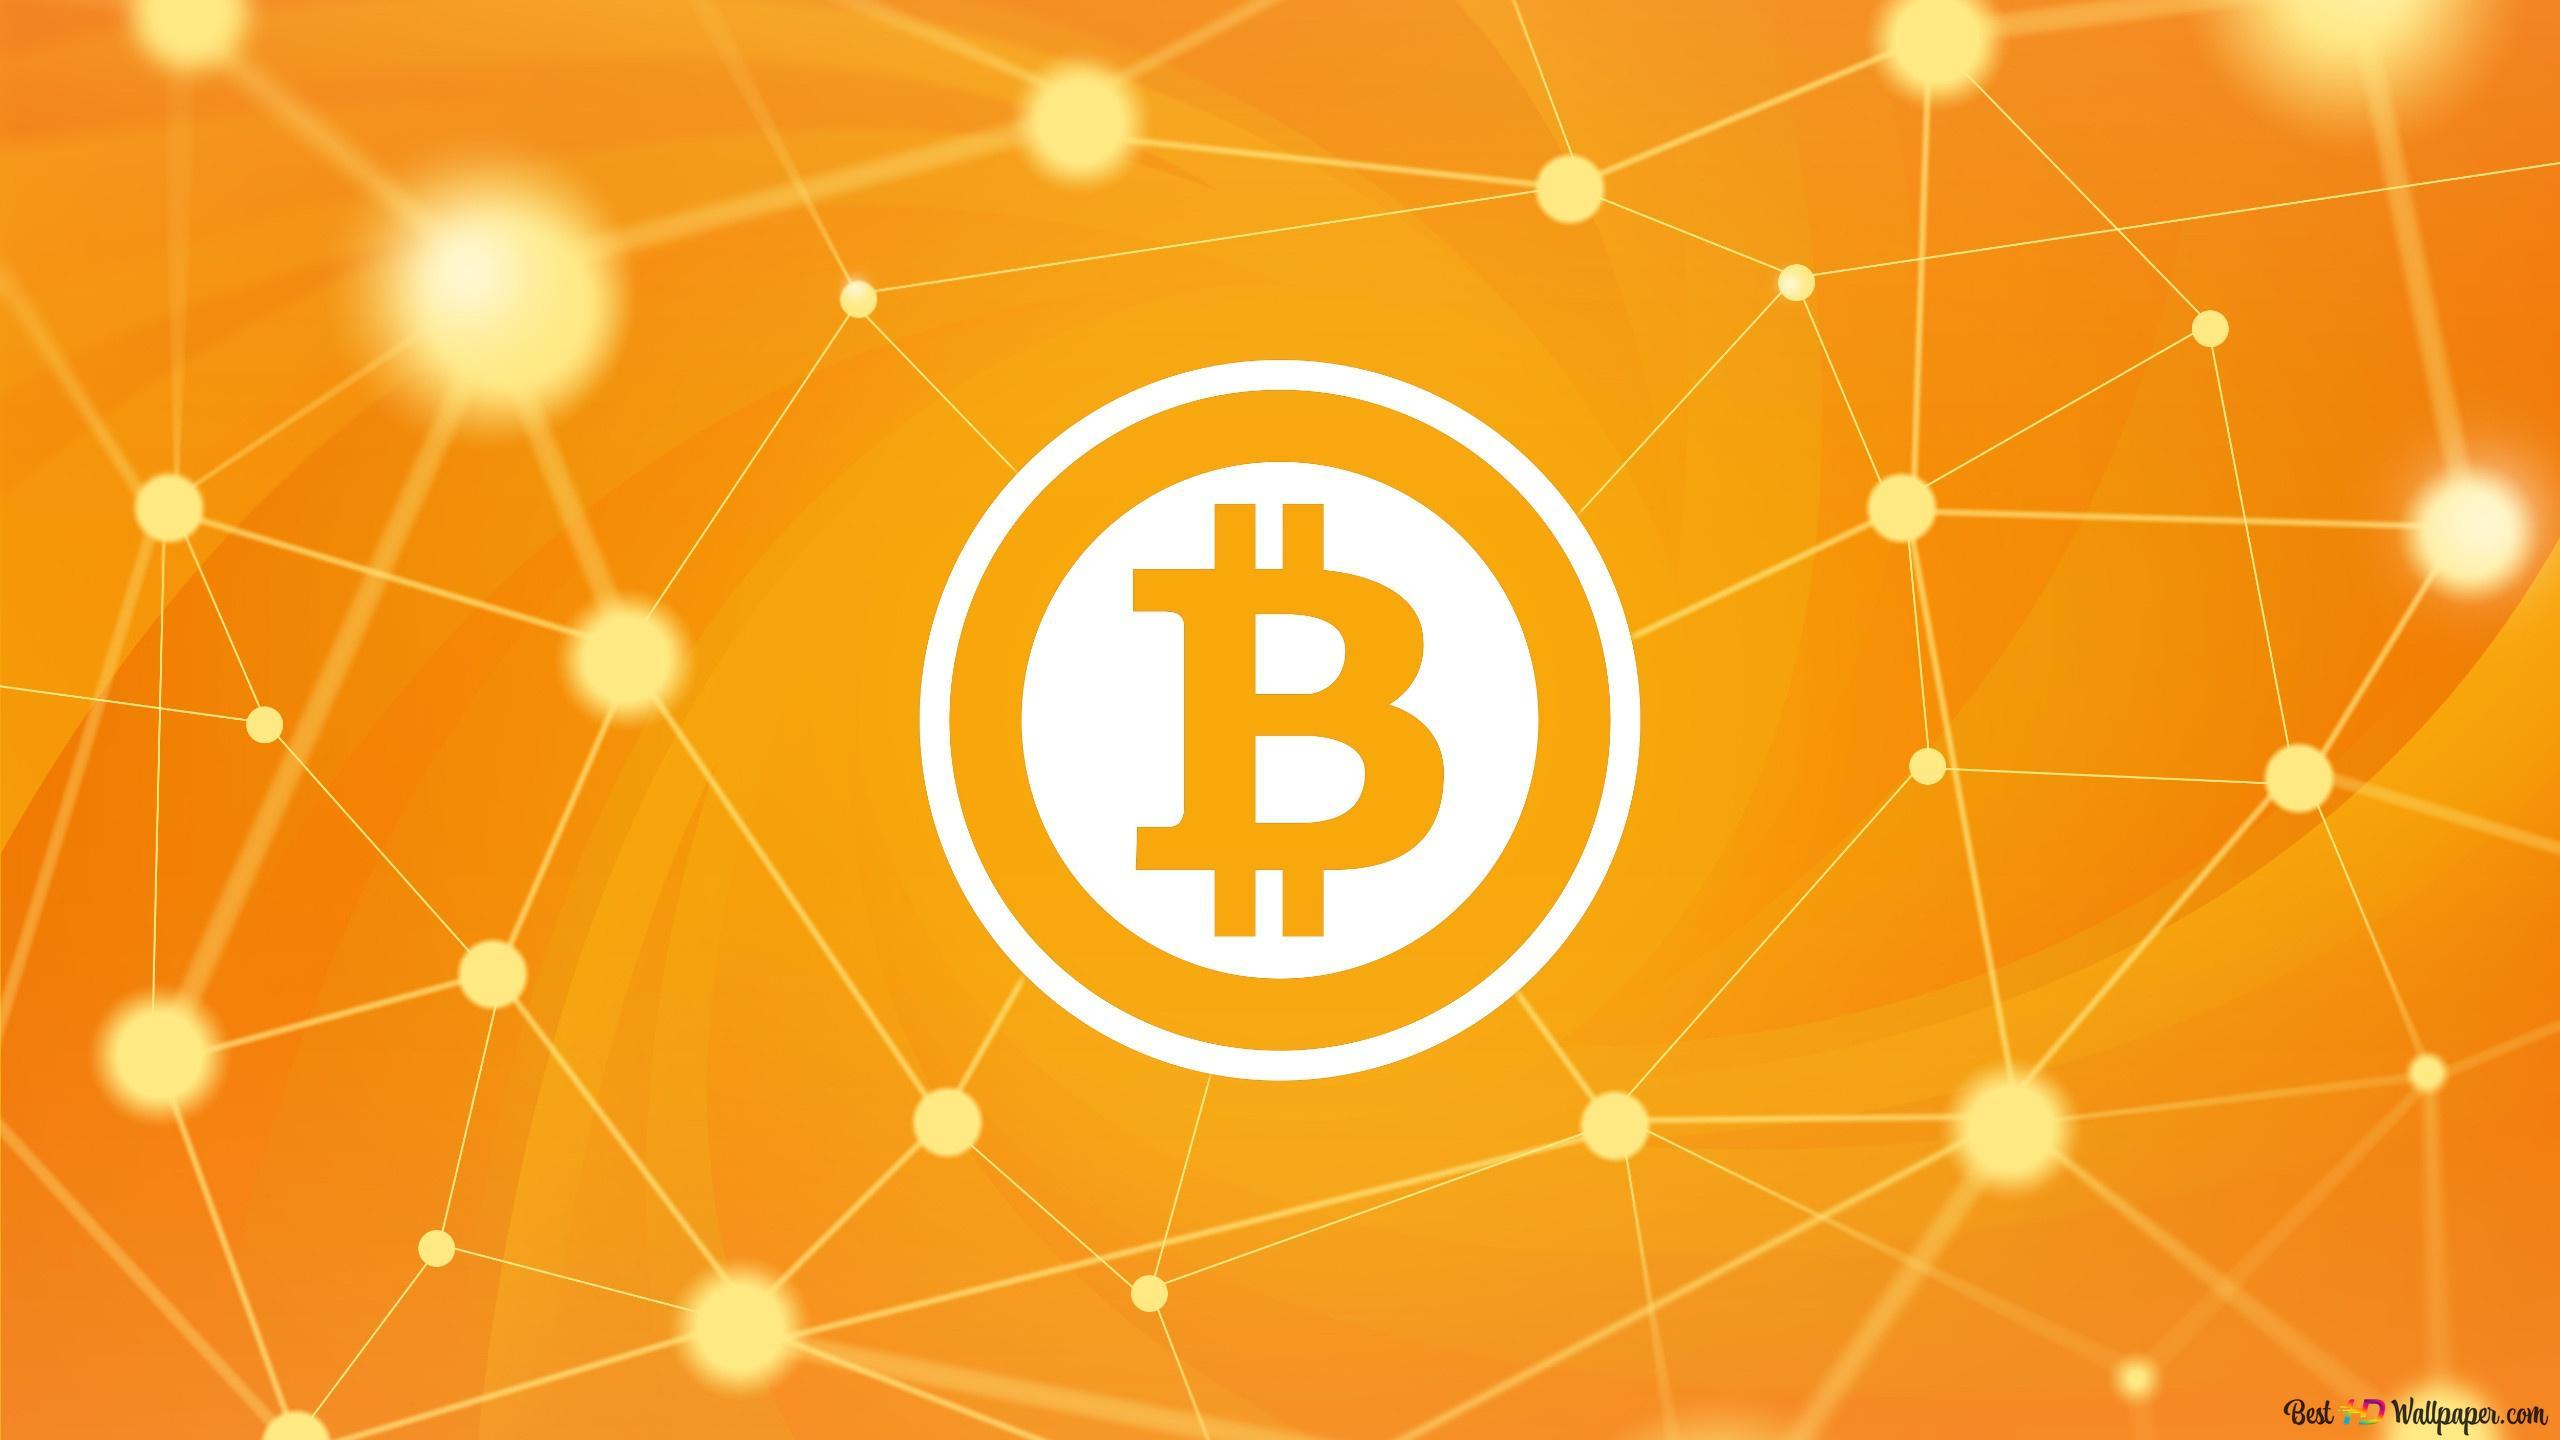 Bitcoin Logo Hd Wallpaper Download